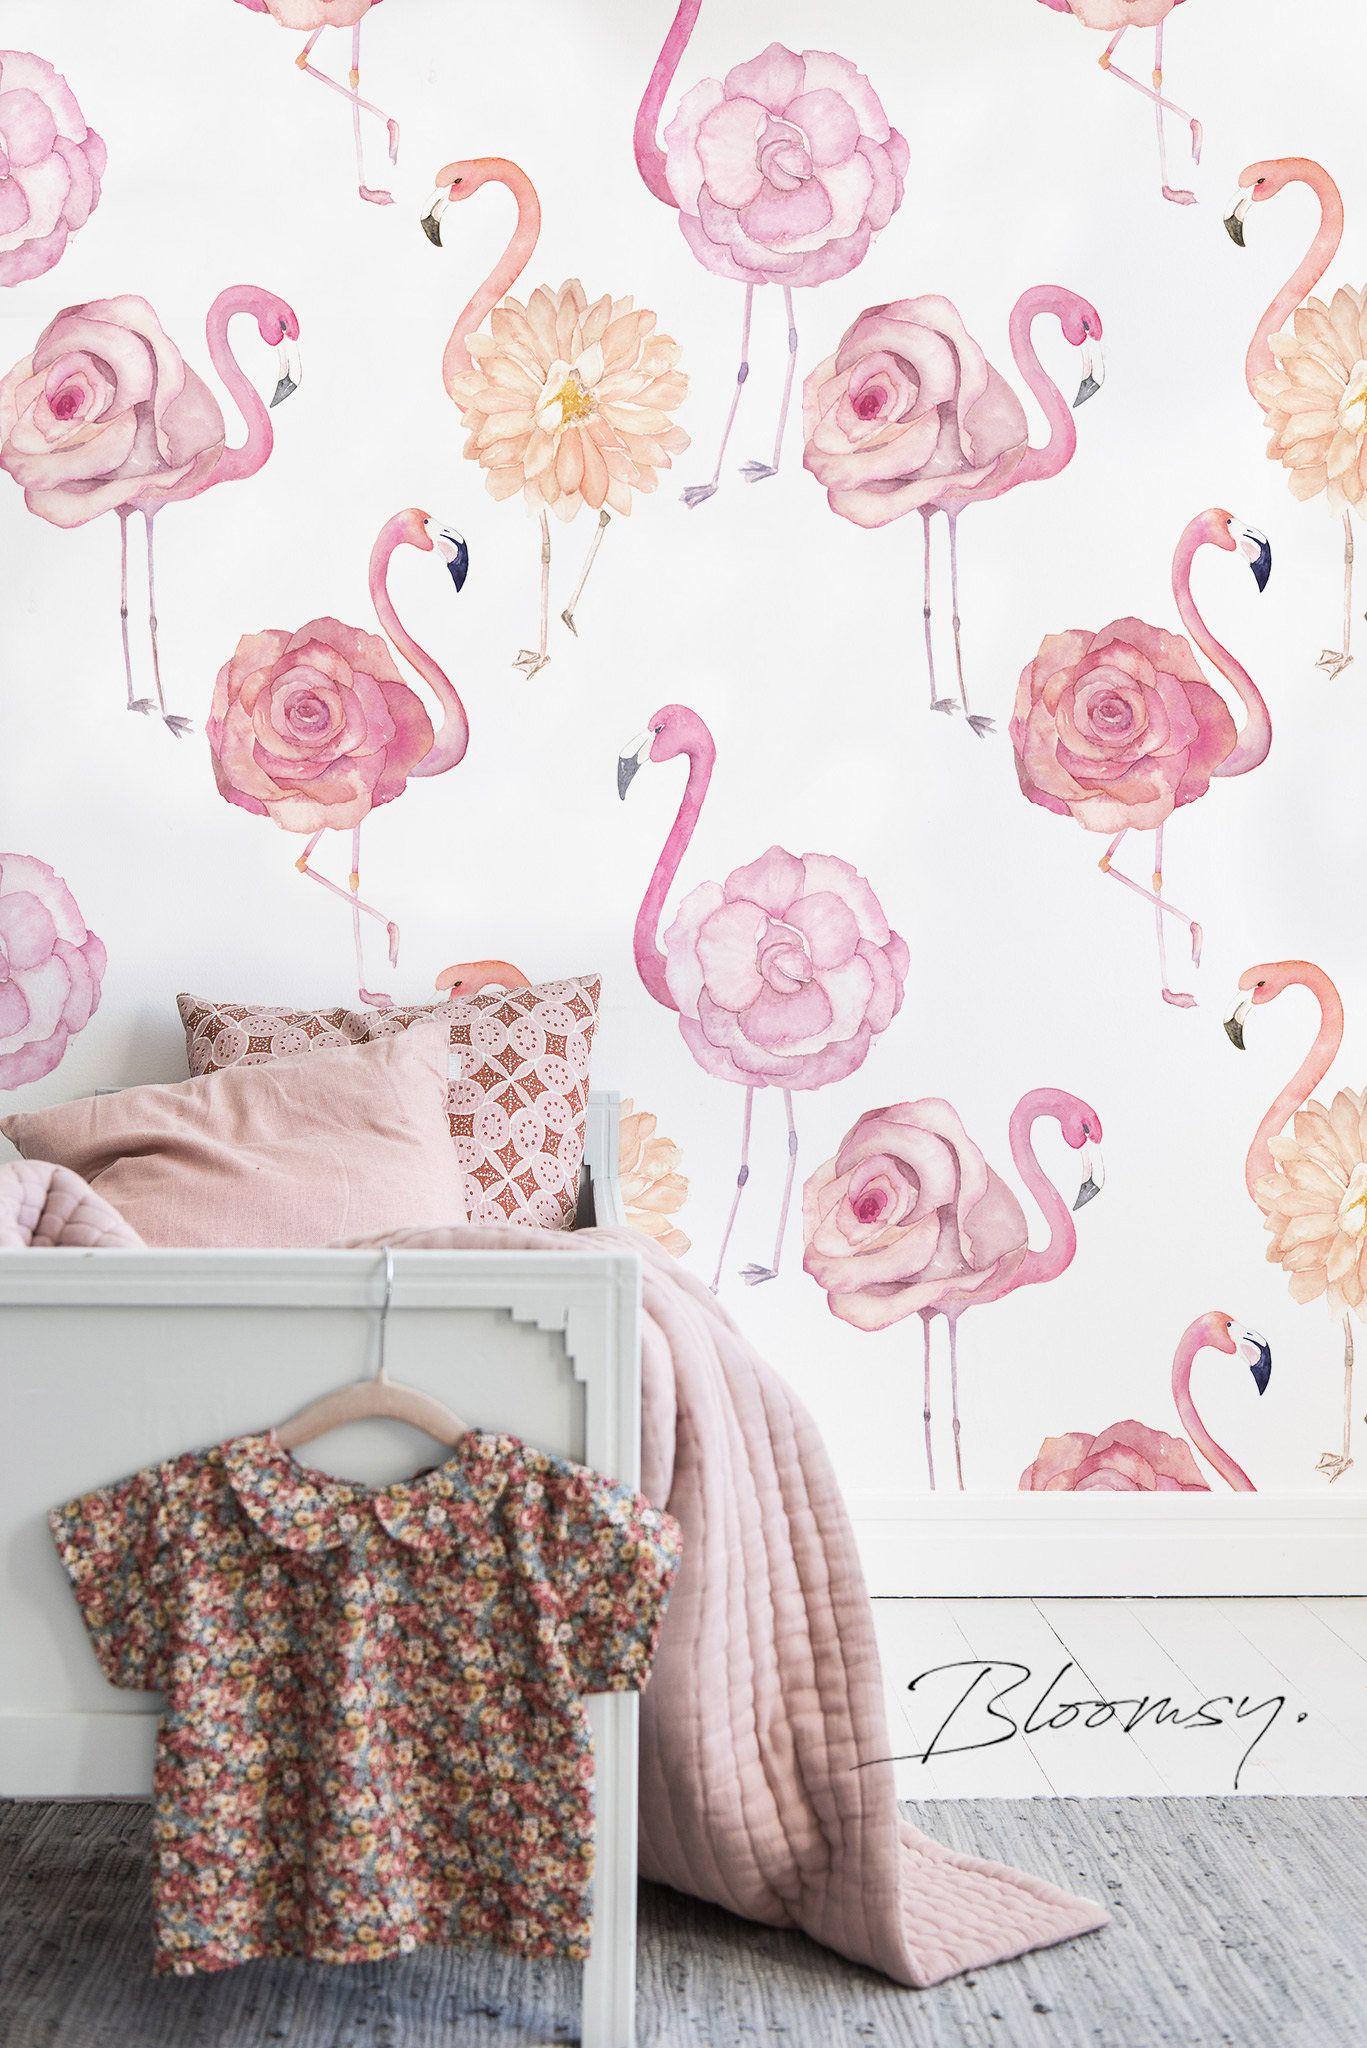 Removable Wallpaper Flamingo Roses Wallpaper Peel And Etsy Removable Wallpaper Wallpaper Bedroom Rose Wallpaper